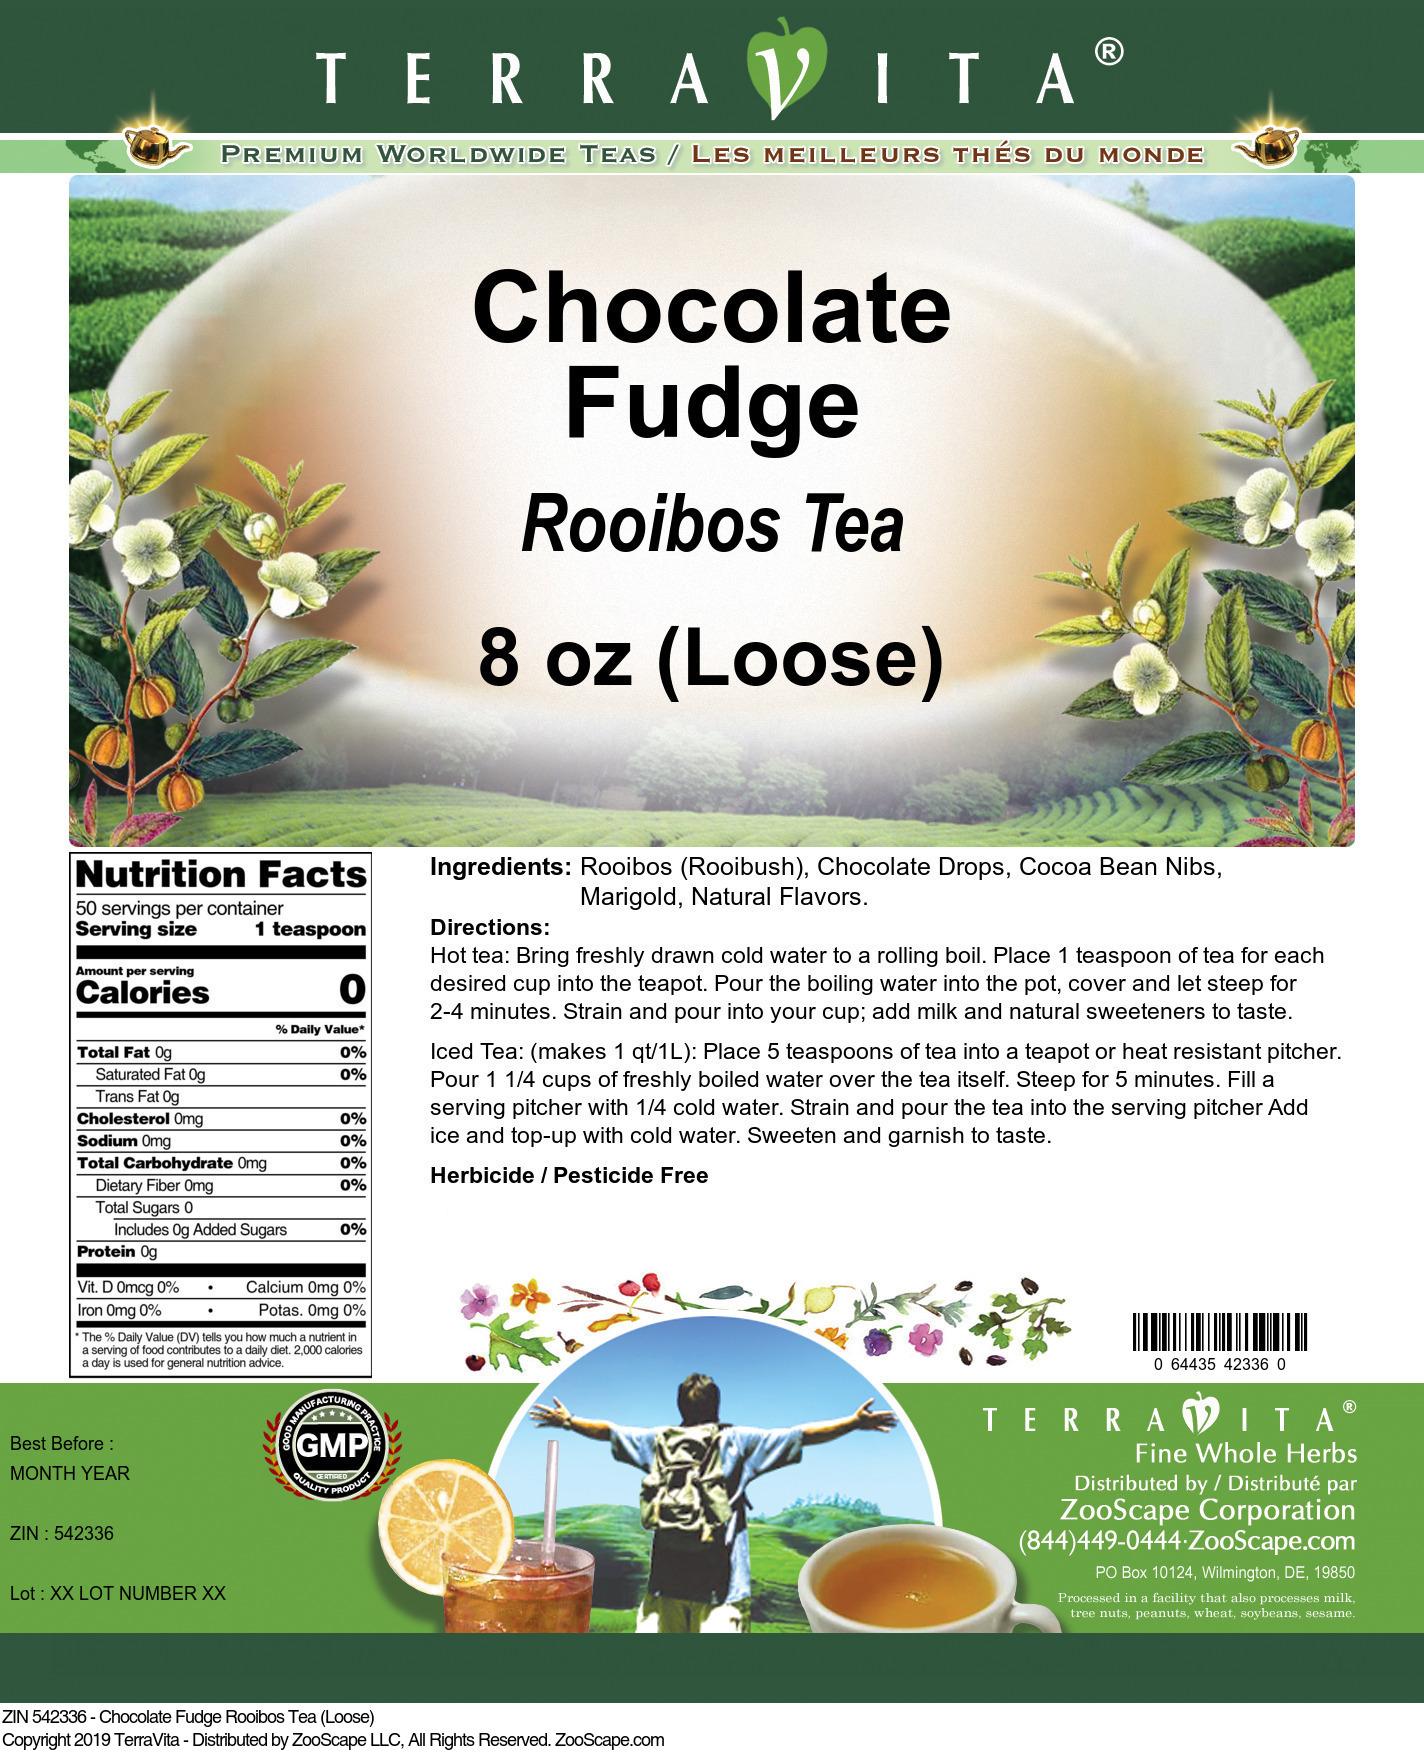 Chocolate Fudge Rooibos Tea (Loose)